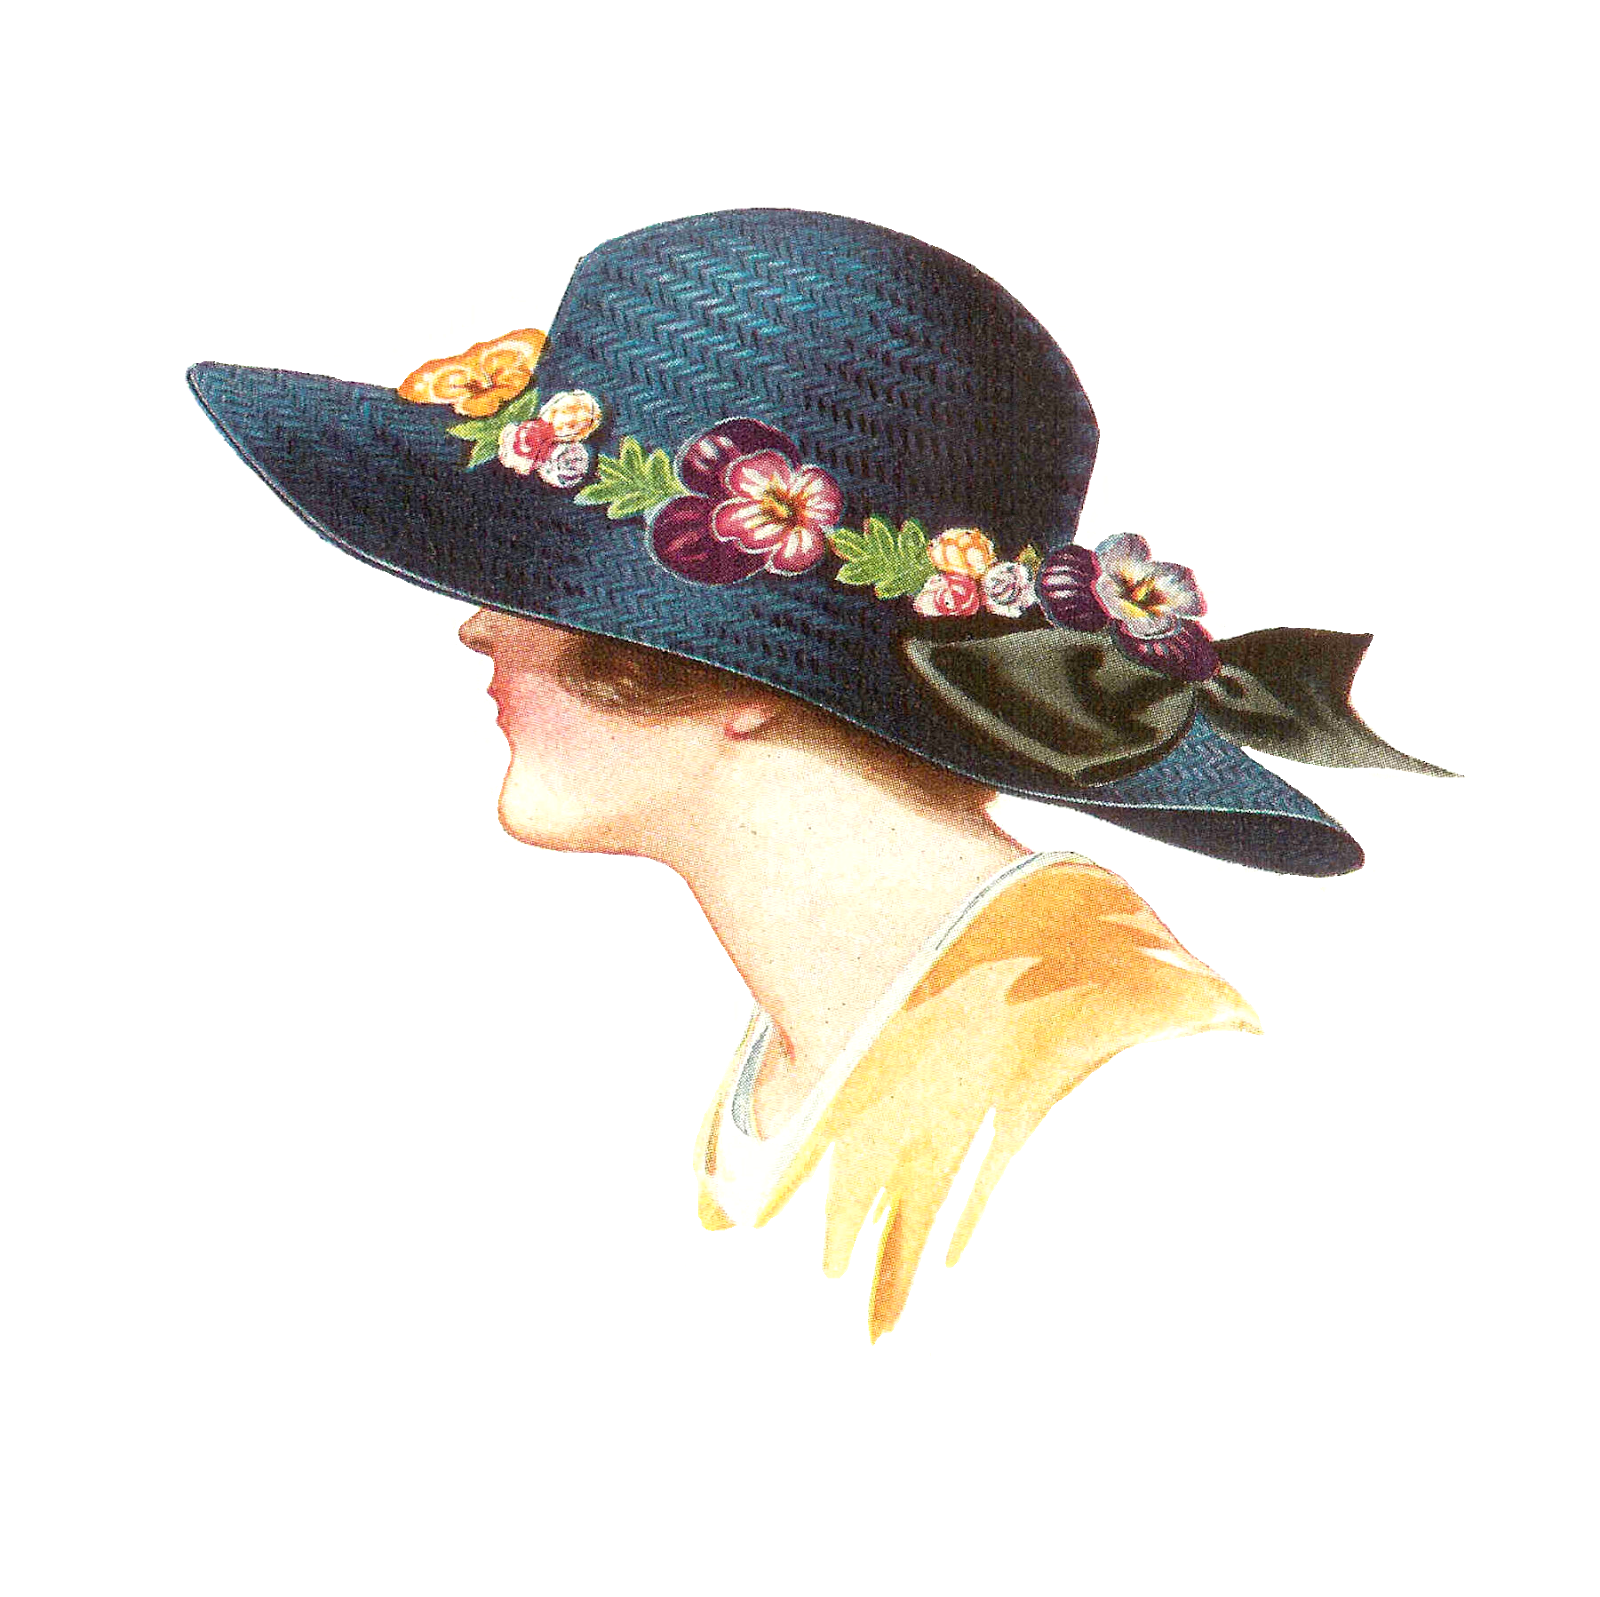 Clipart sun hats image royalty free stock Antique Images: Free Hat Fashion Clip Art: 1915 Women's Spring Hat ... image royalty free stock